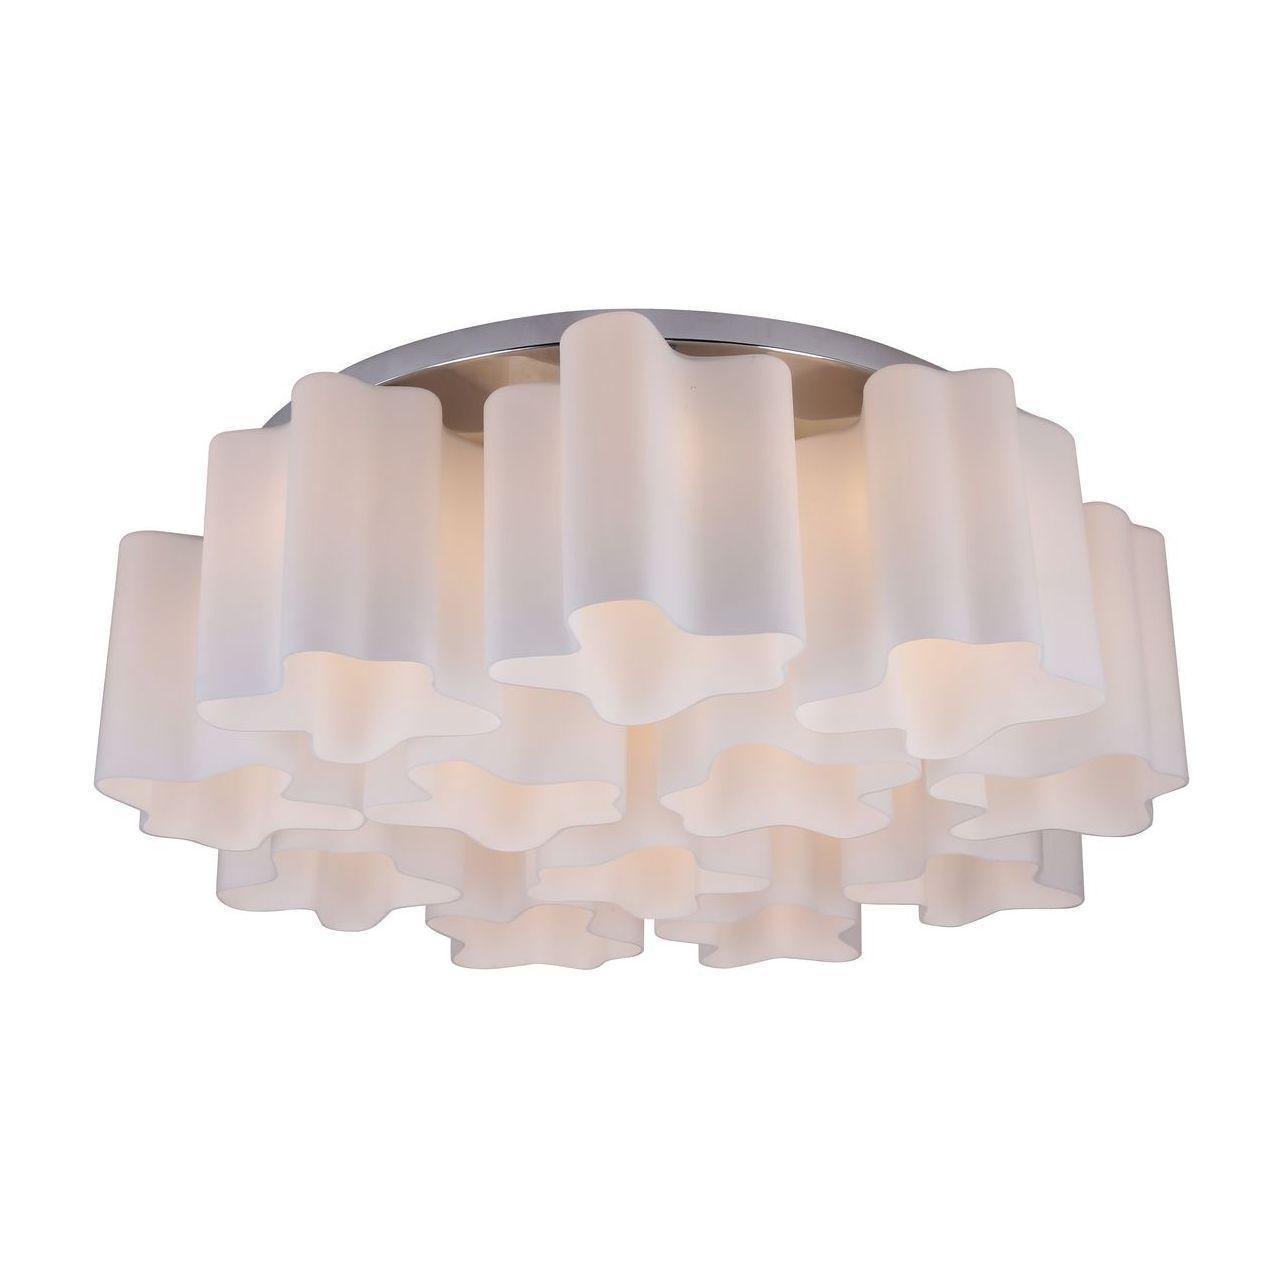 Люстра Arte Lamp A3479PL-12CC потолочная arte lamp потолочная люстра arte lamp 18 a3479pl 3cc